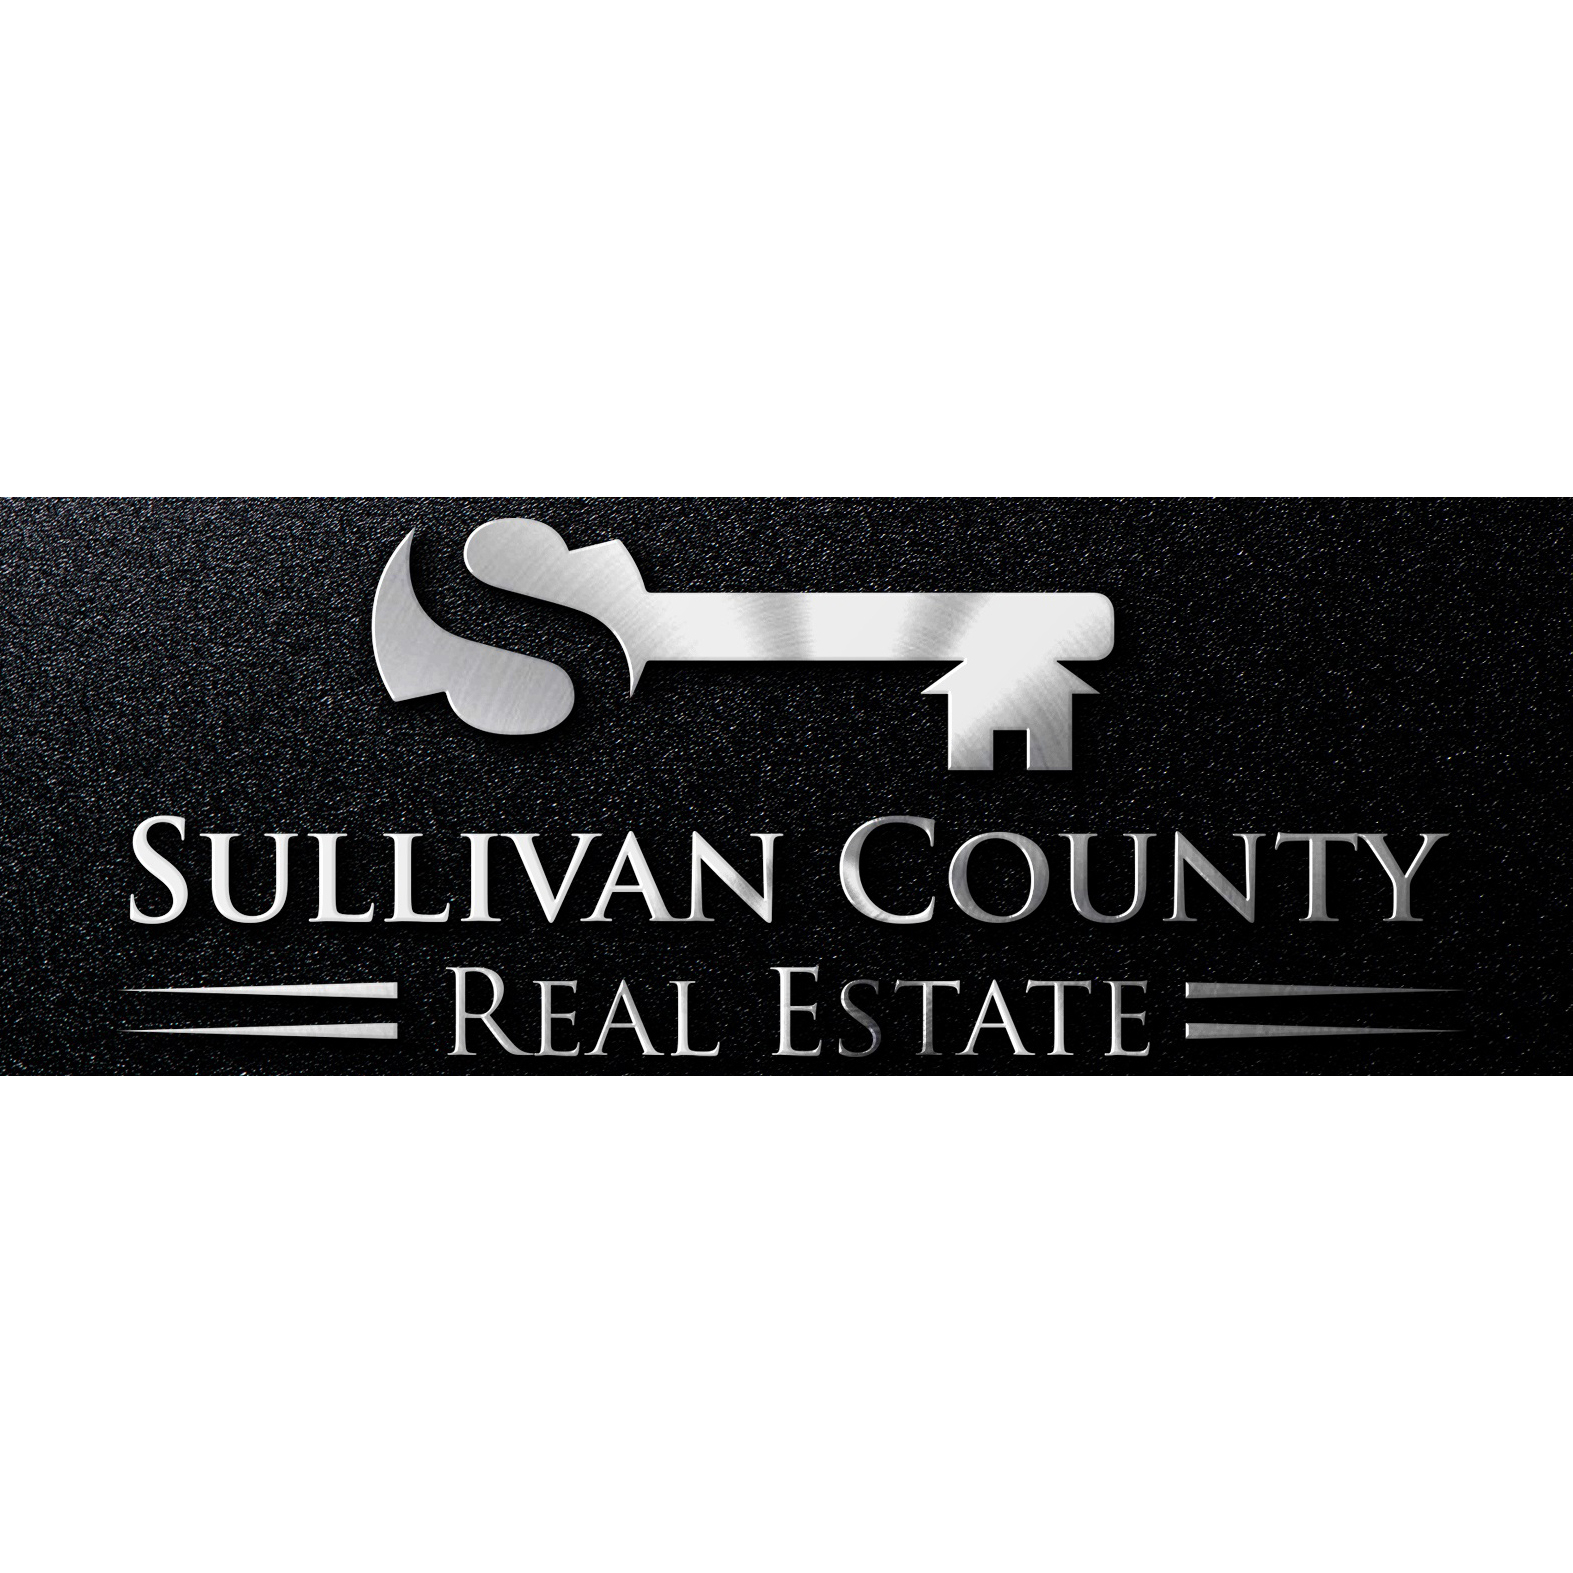 Sullivan County NY Real Estate image 4